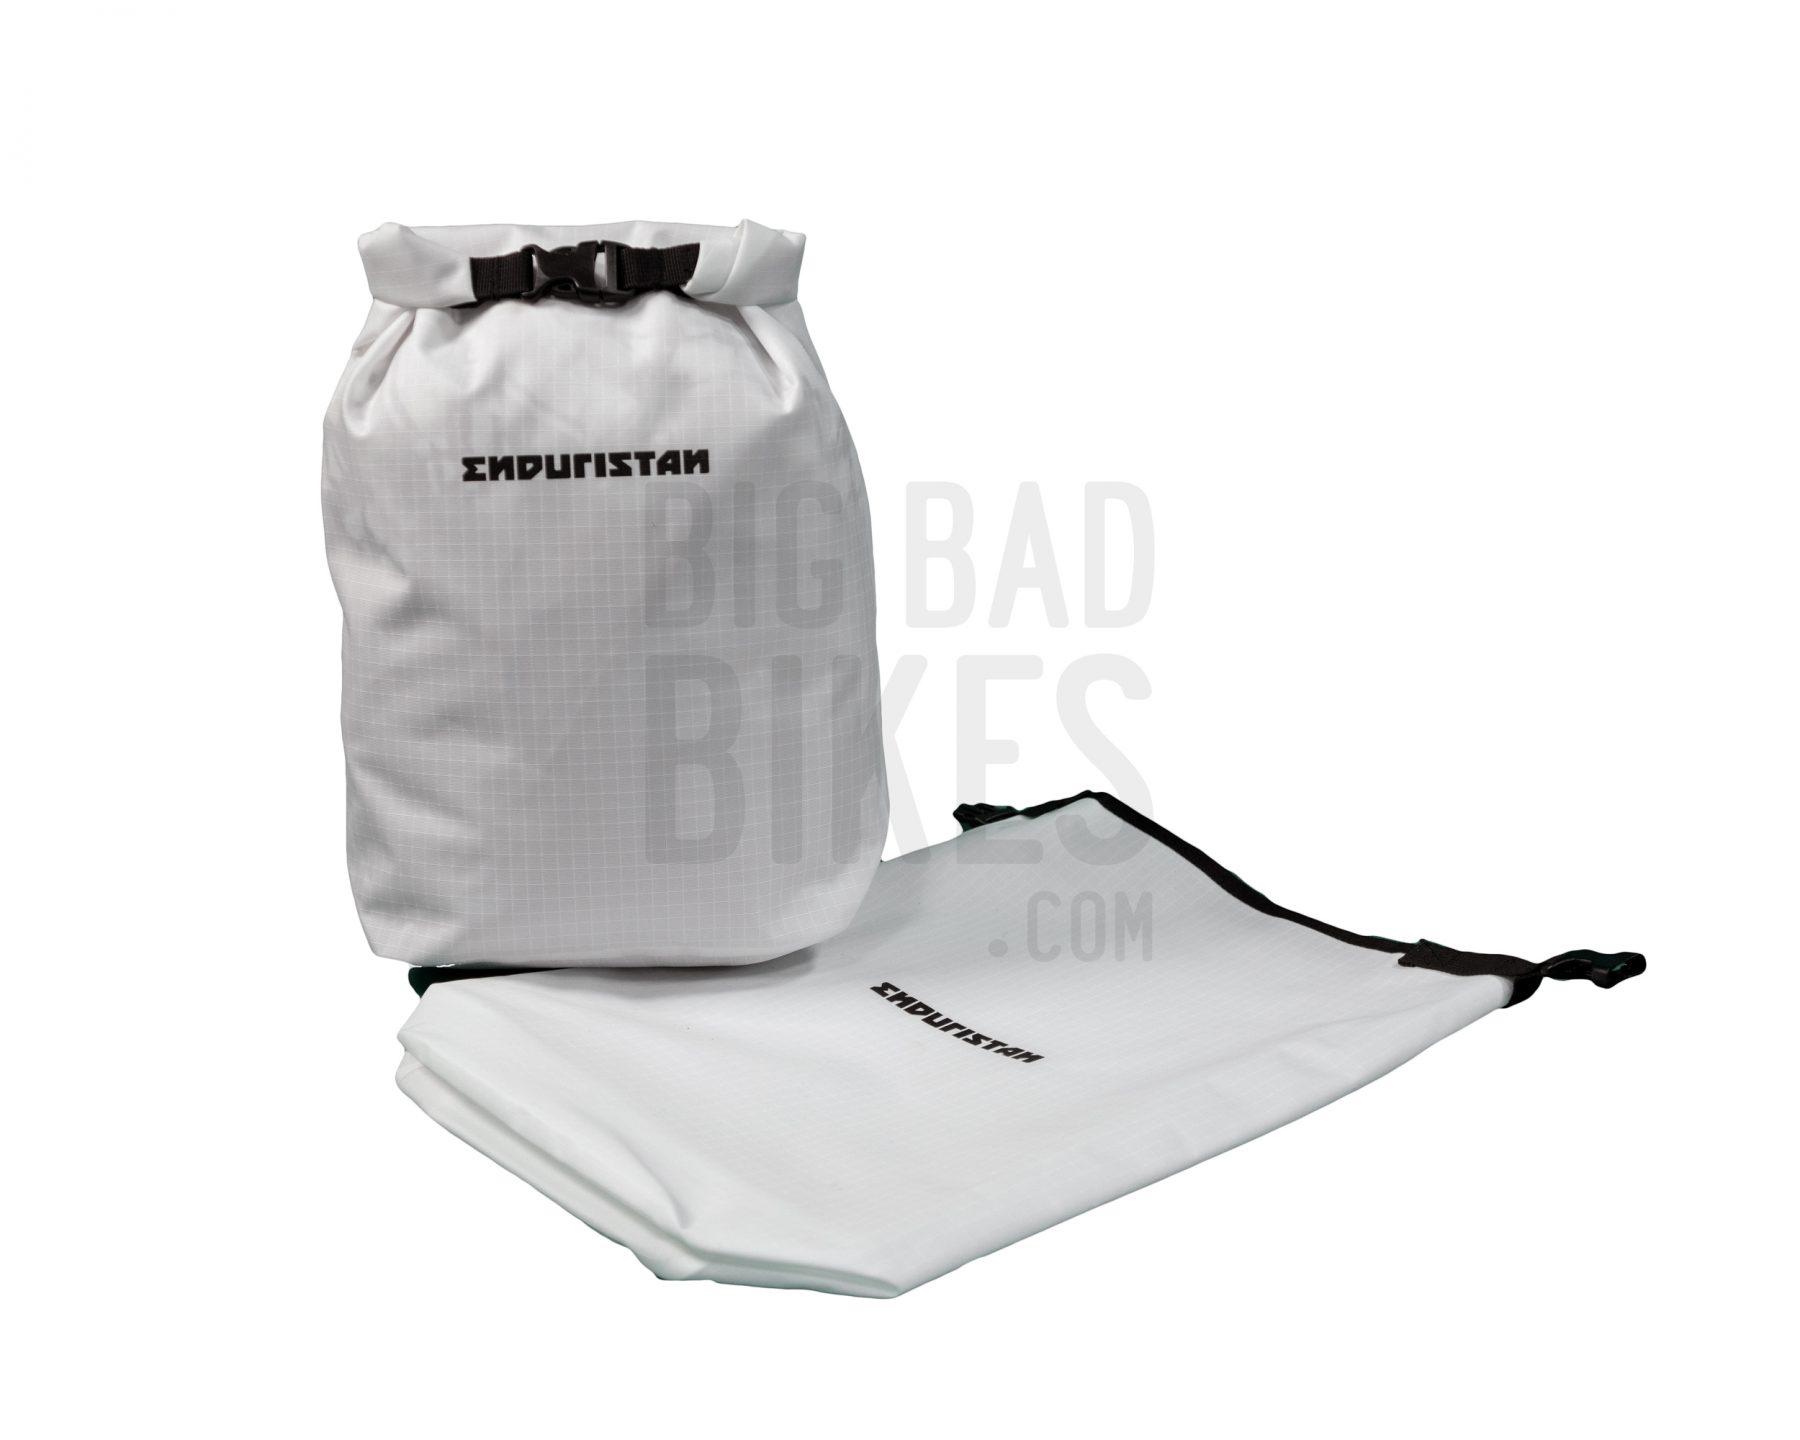 Enduristan_LUOR-001_Isolation_Bag_004